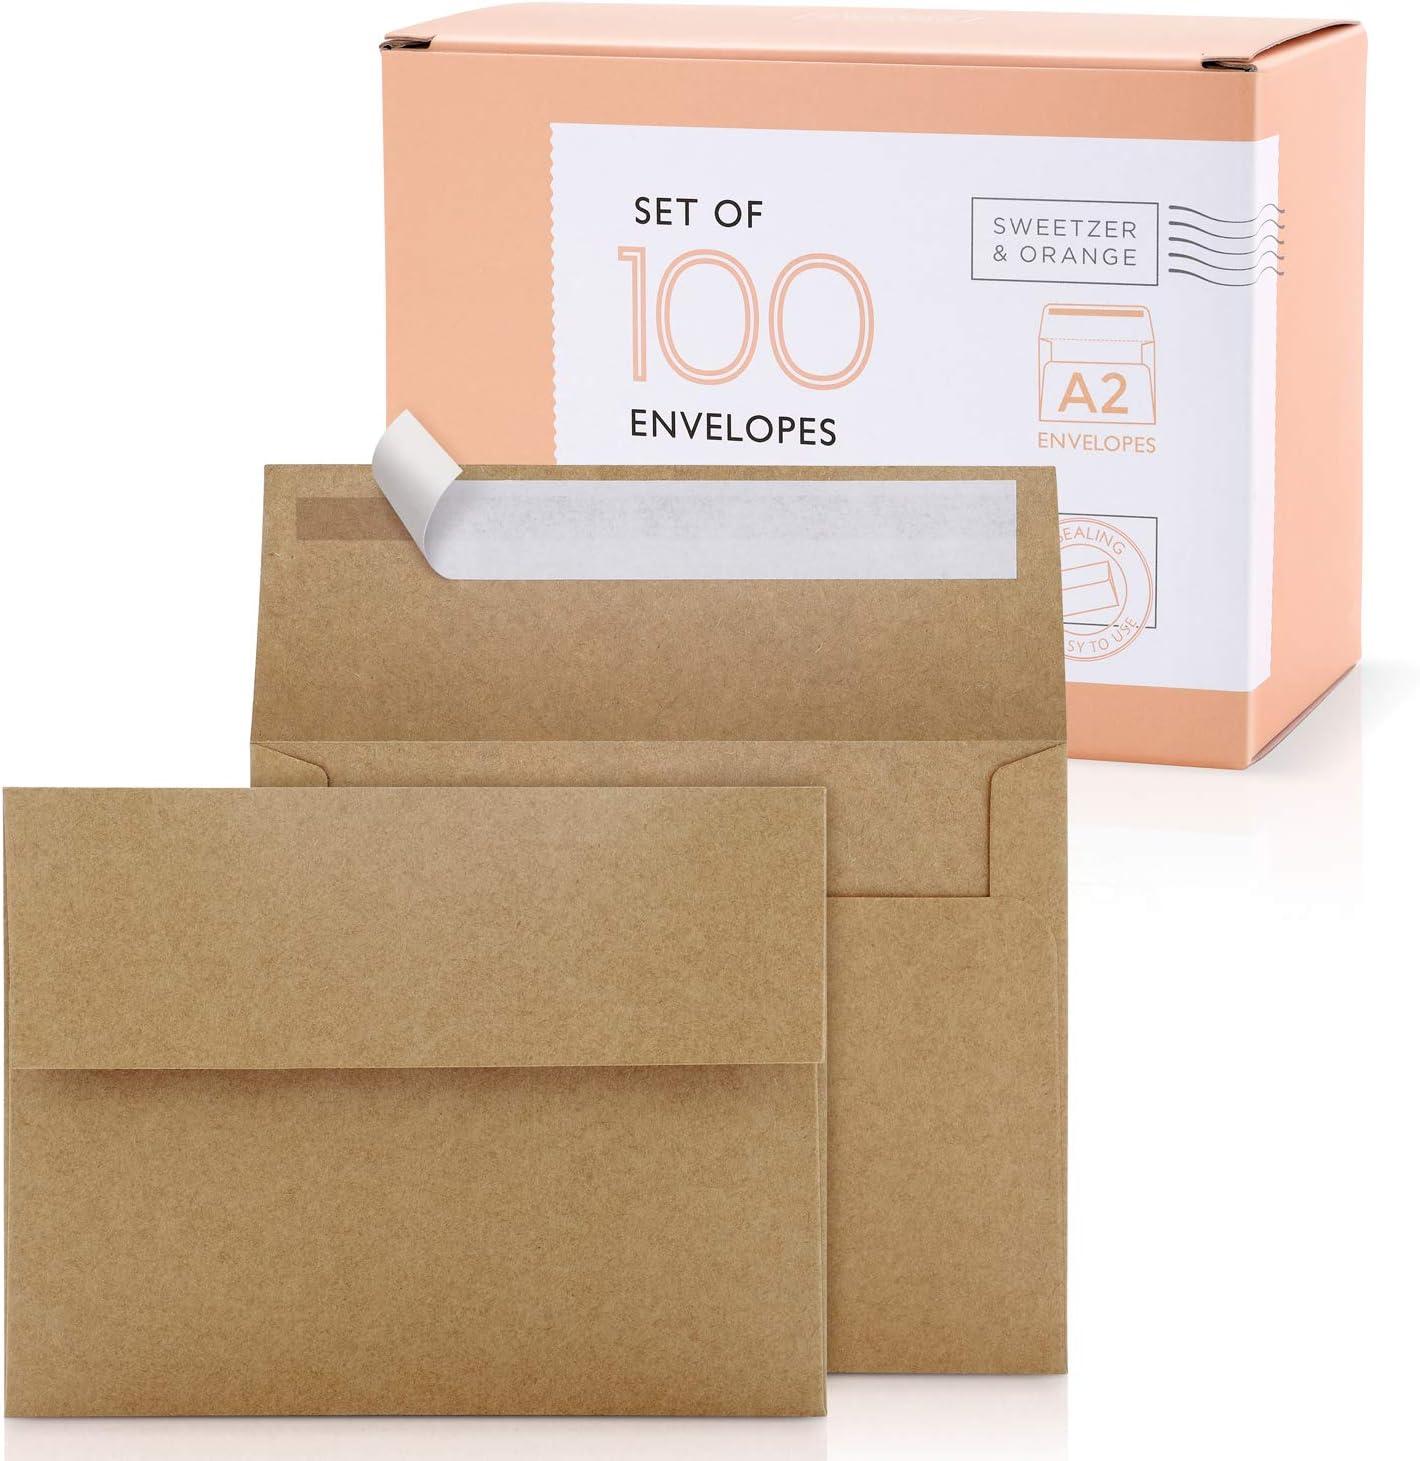 Sweetzer & Orange A2 Envelopes (100 with Box). Brown Envelopes Self Seal. Luxury 150gsm For Greeting Card Envelopes and Invitation Envelopes 4-3/8 x 5-3/4, RSVP Envelopes, Plain Kraft Envelopes.